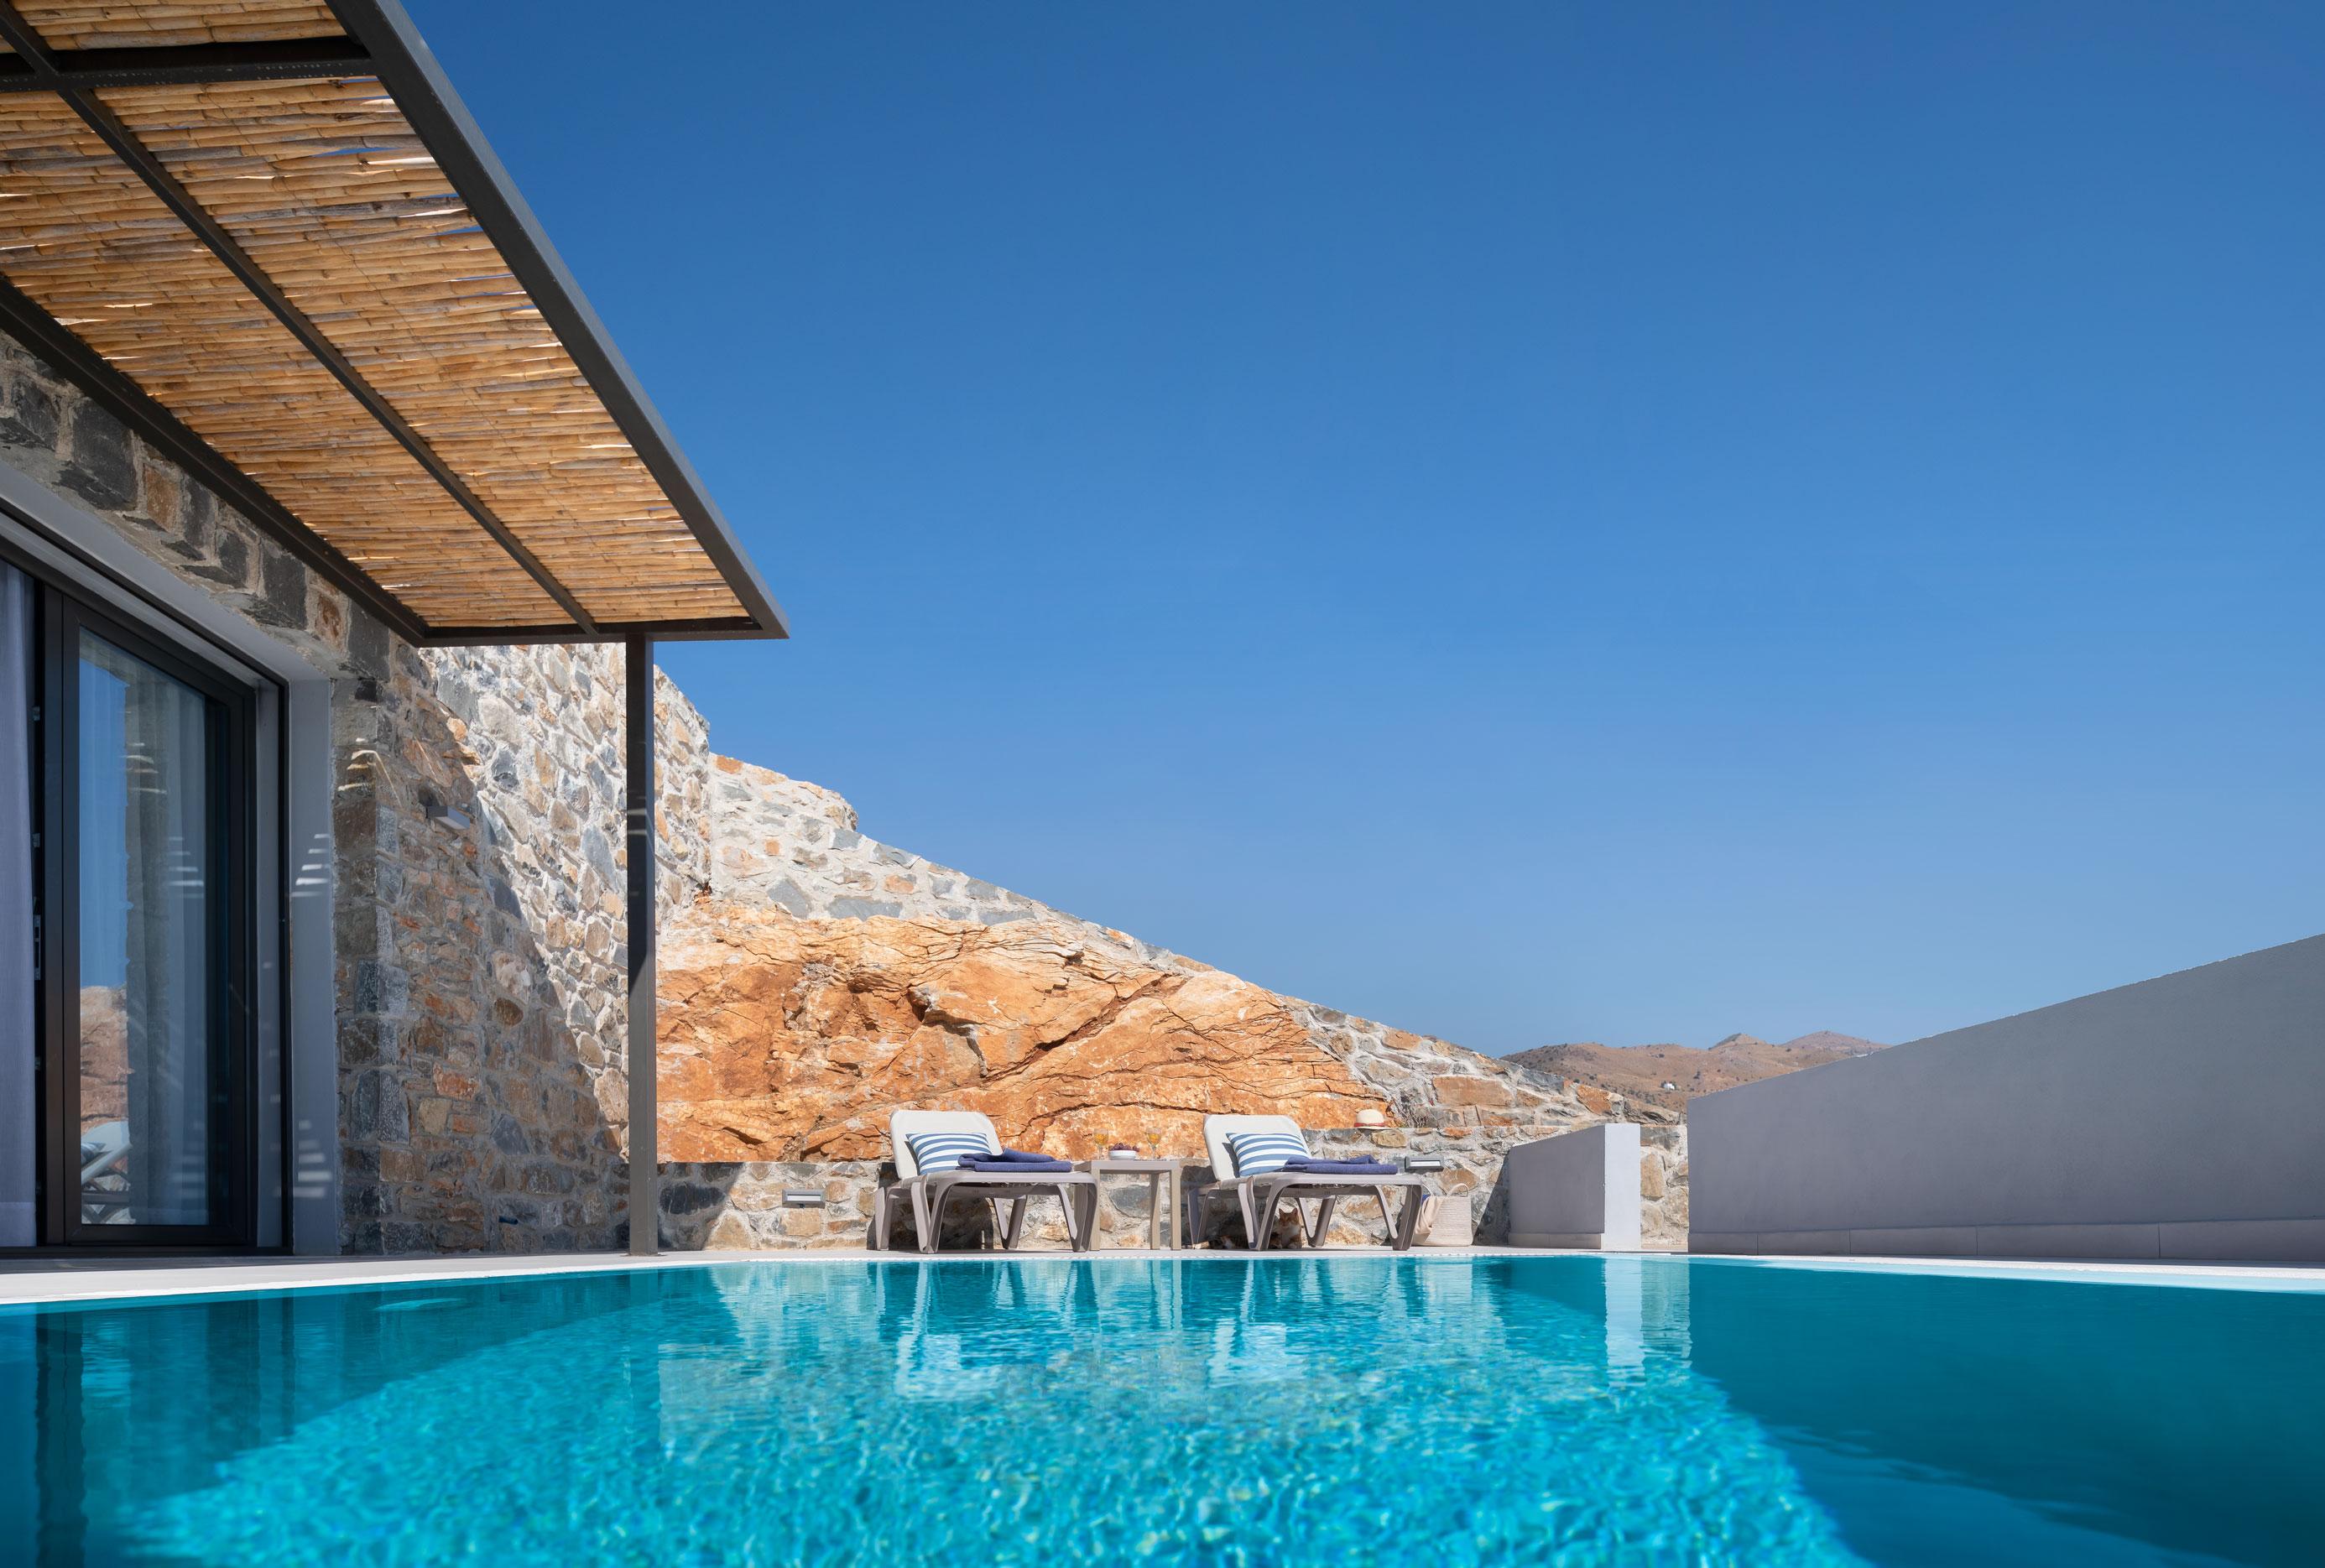 pool-of-1-bedroom-villa